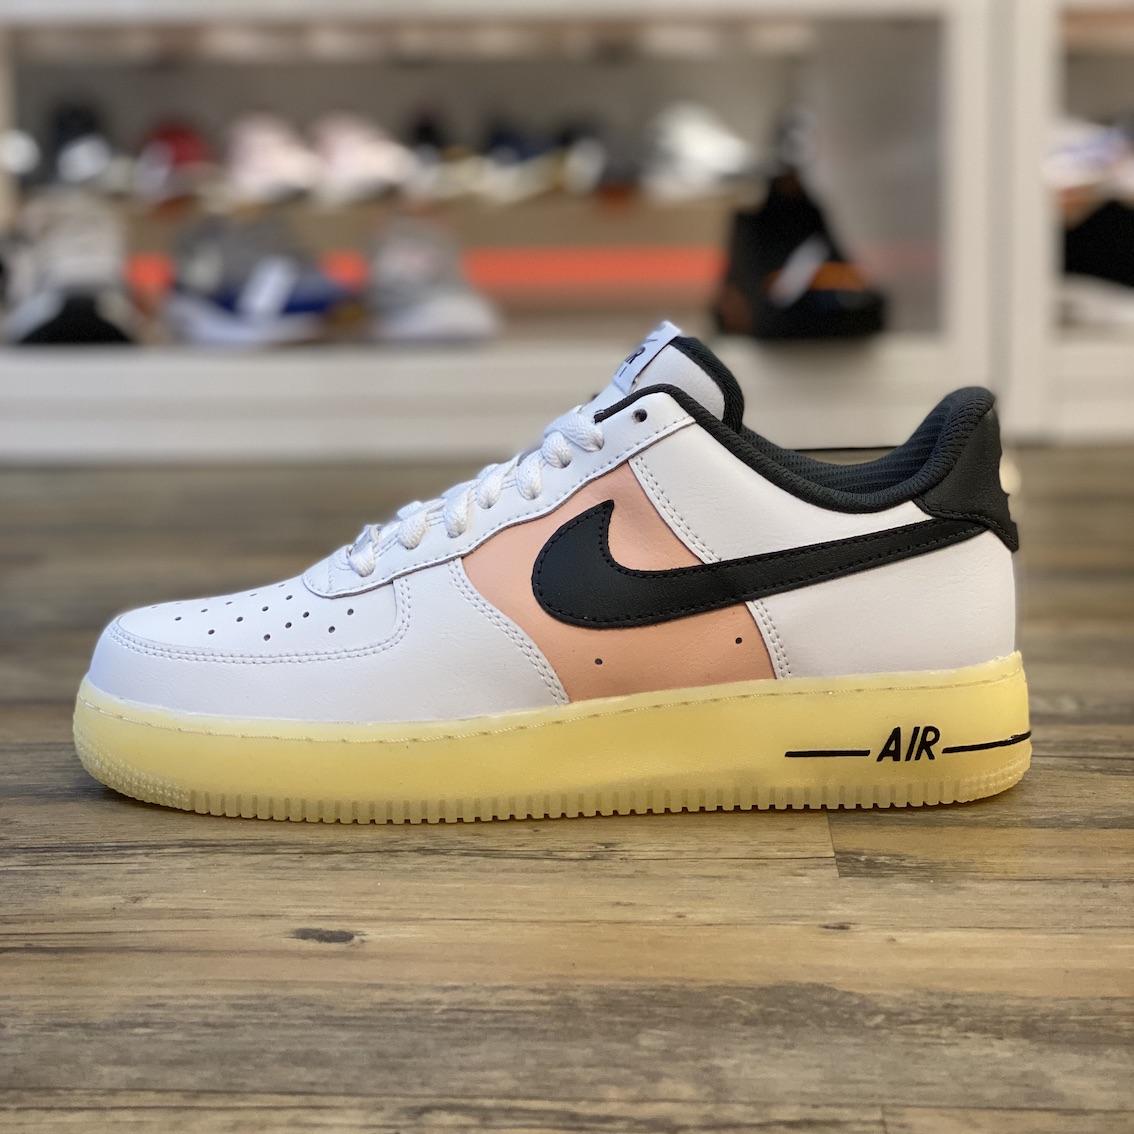 Détails sur Nike Air Force 1 Bas Id Gr.41 Baskets Blanc AQ3778 992 Chaussures Classic Retro